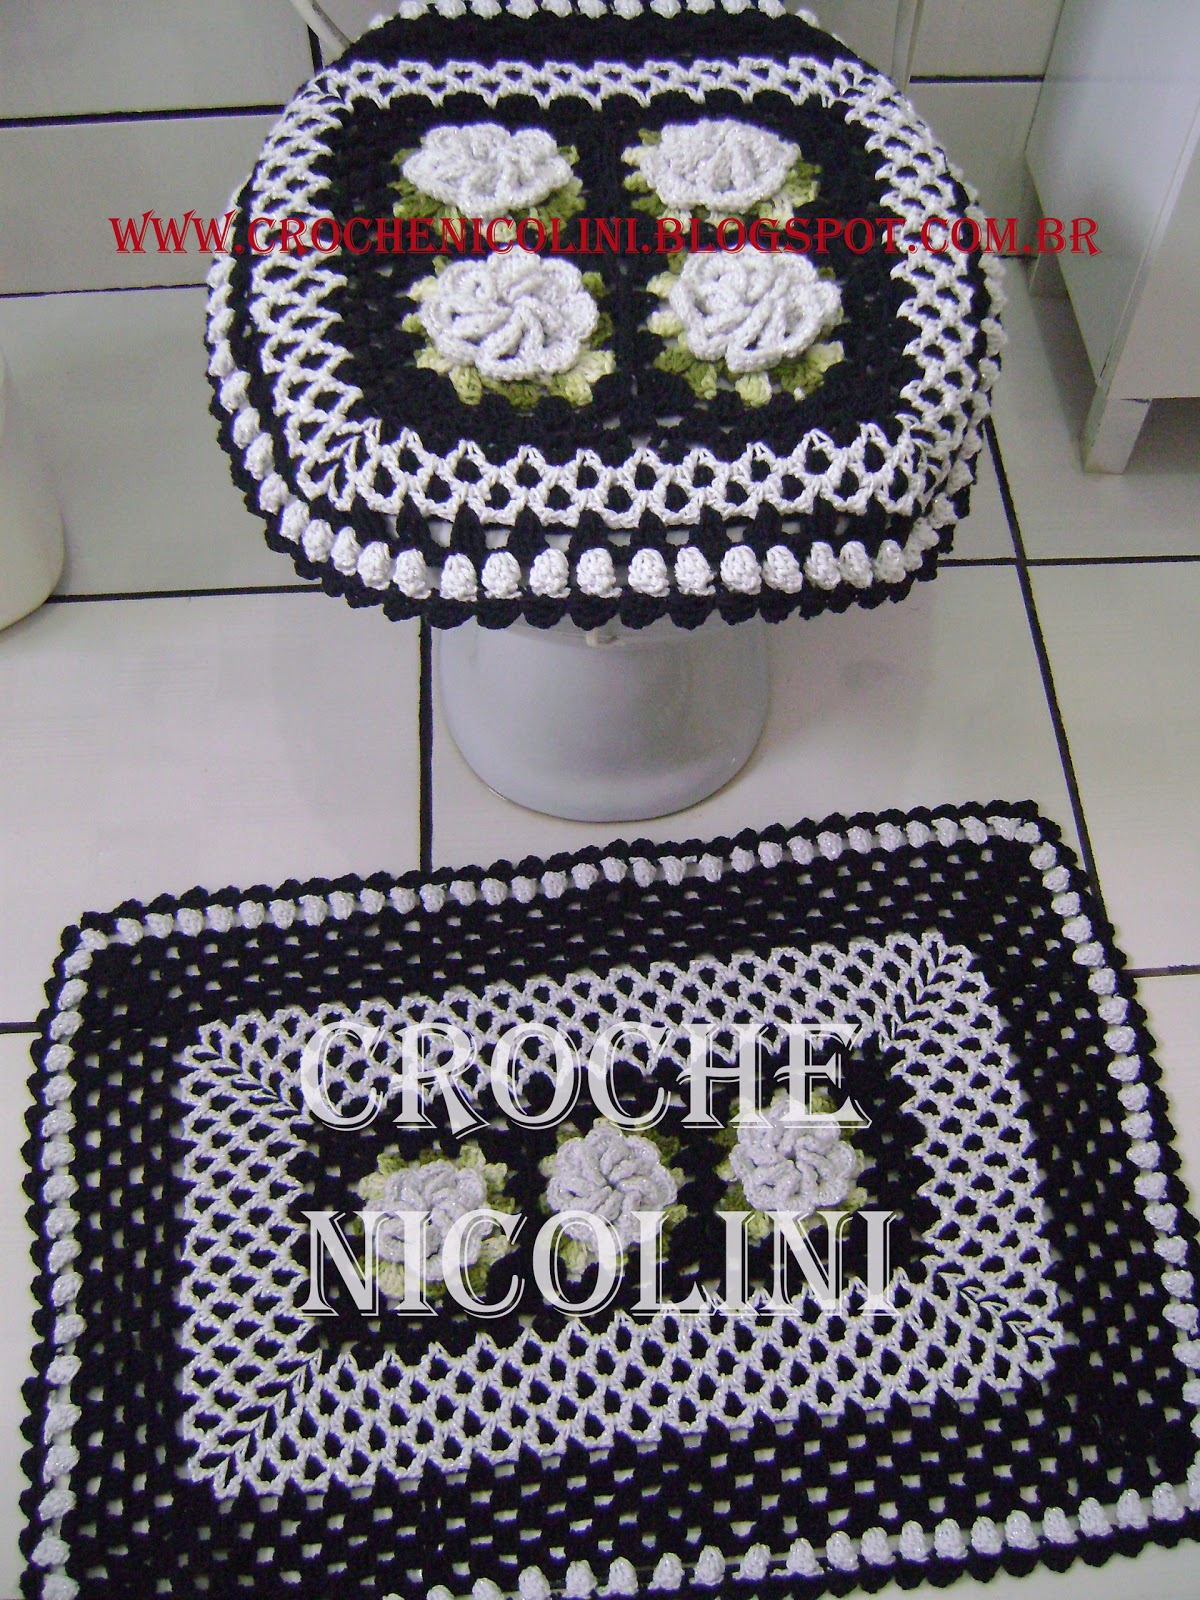 Croche Nicolini: JOGO DE BANHEIRO #7F292D 1200 1600